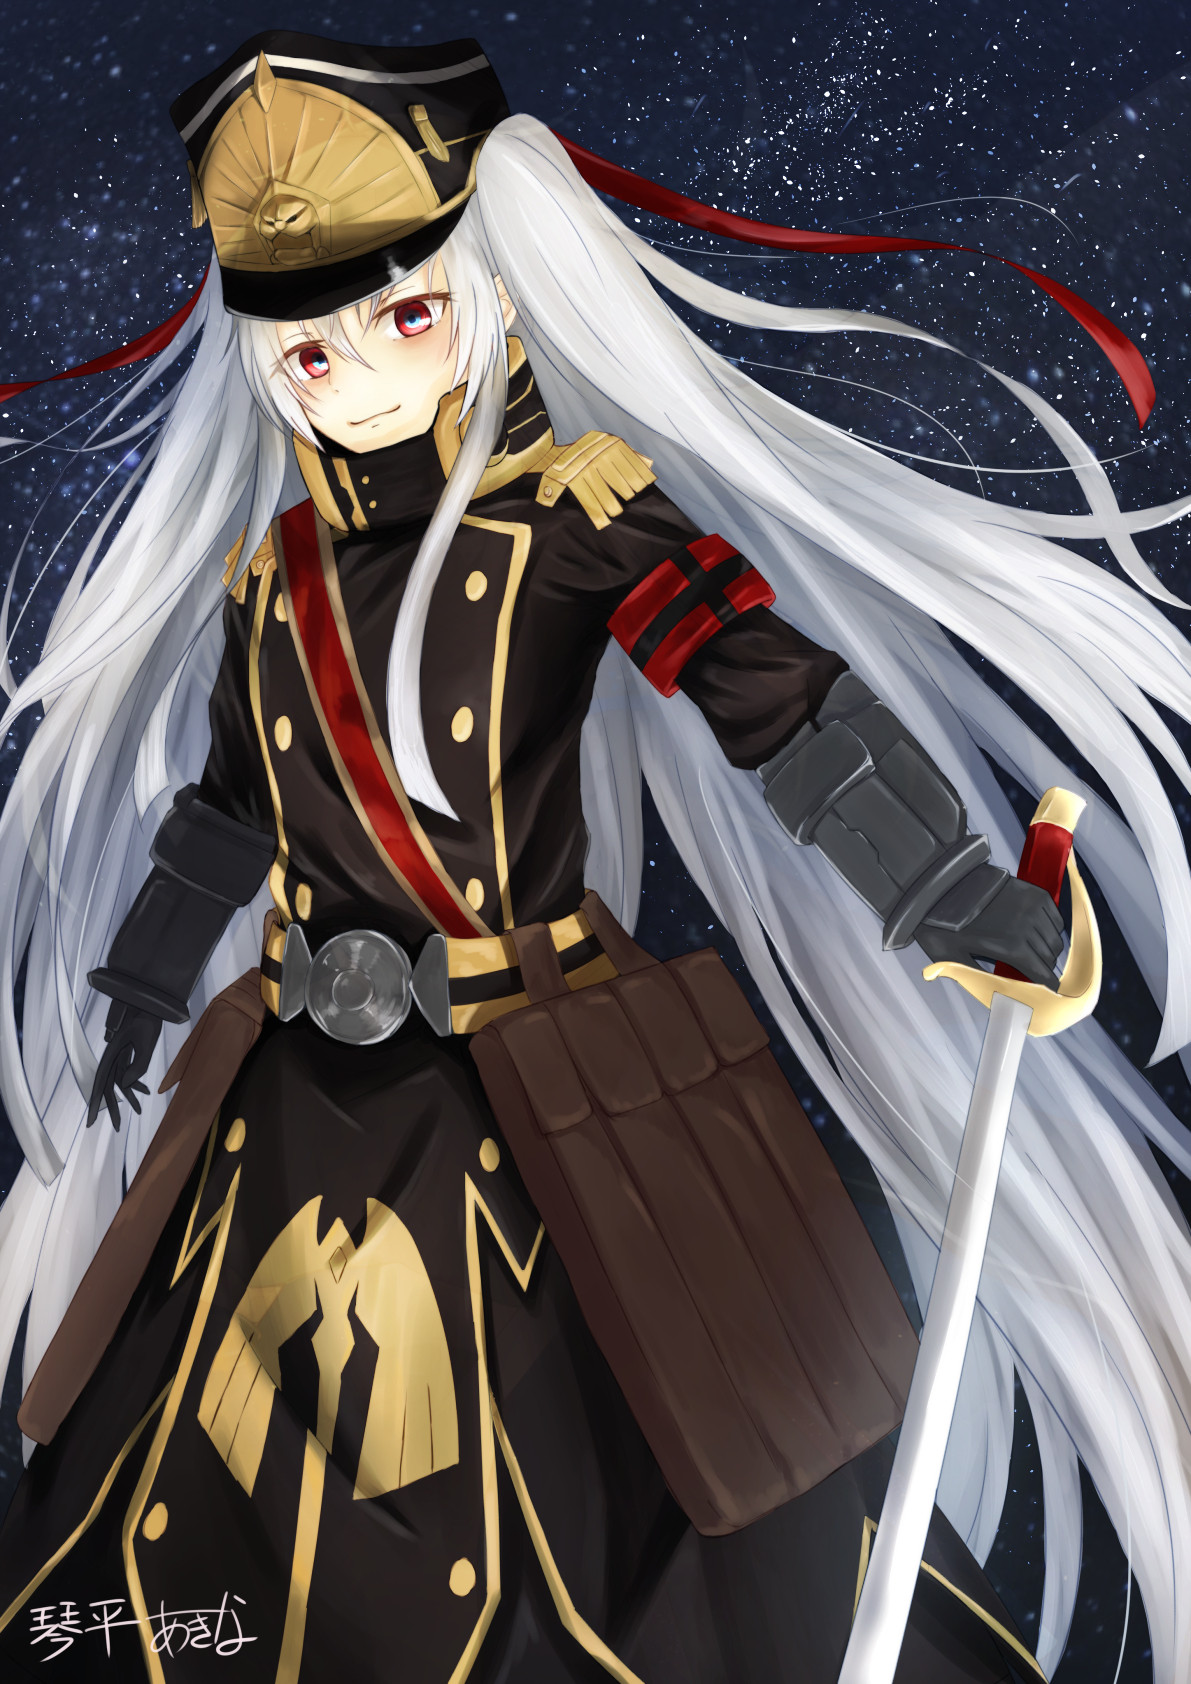 Altair (Re:Creators) Image #2100186 - Zerochan Anime Image ...